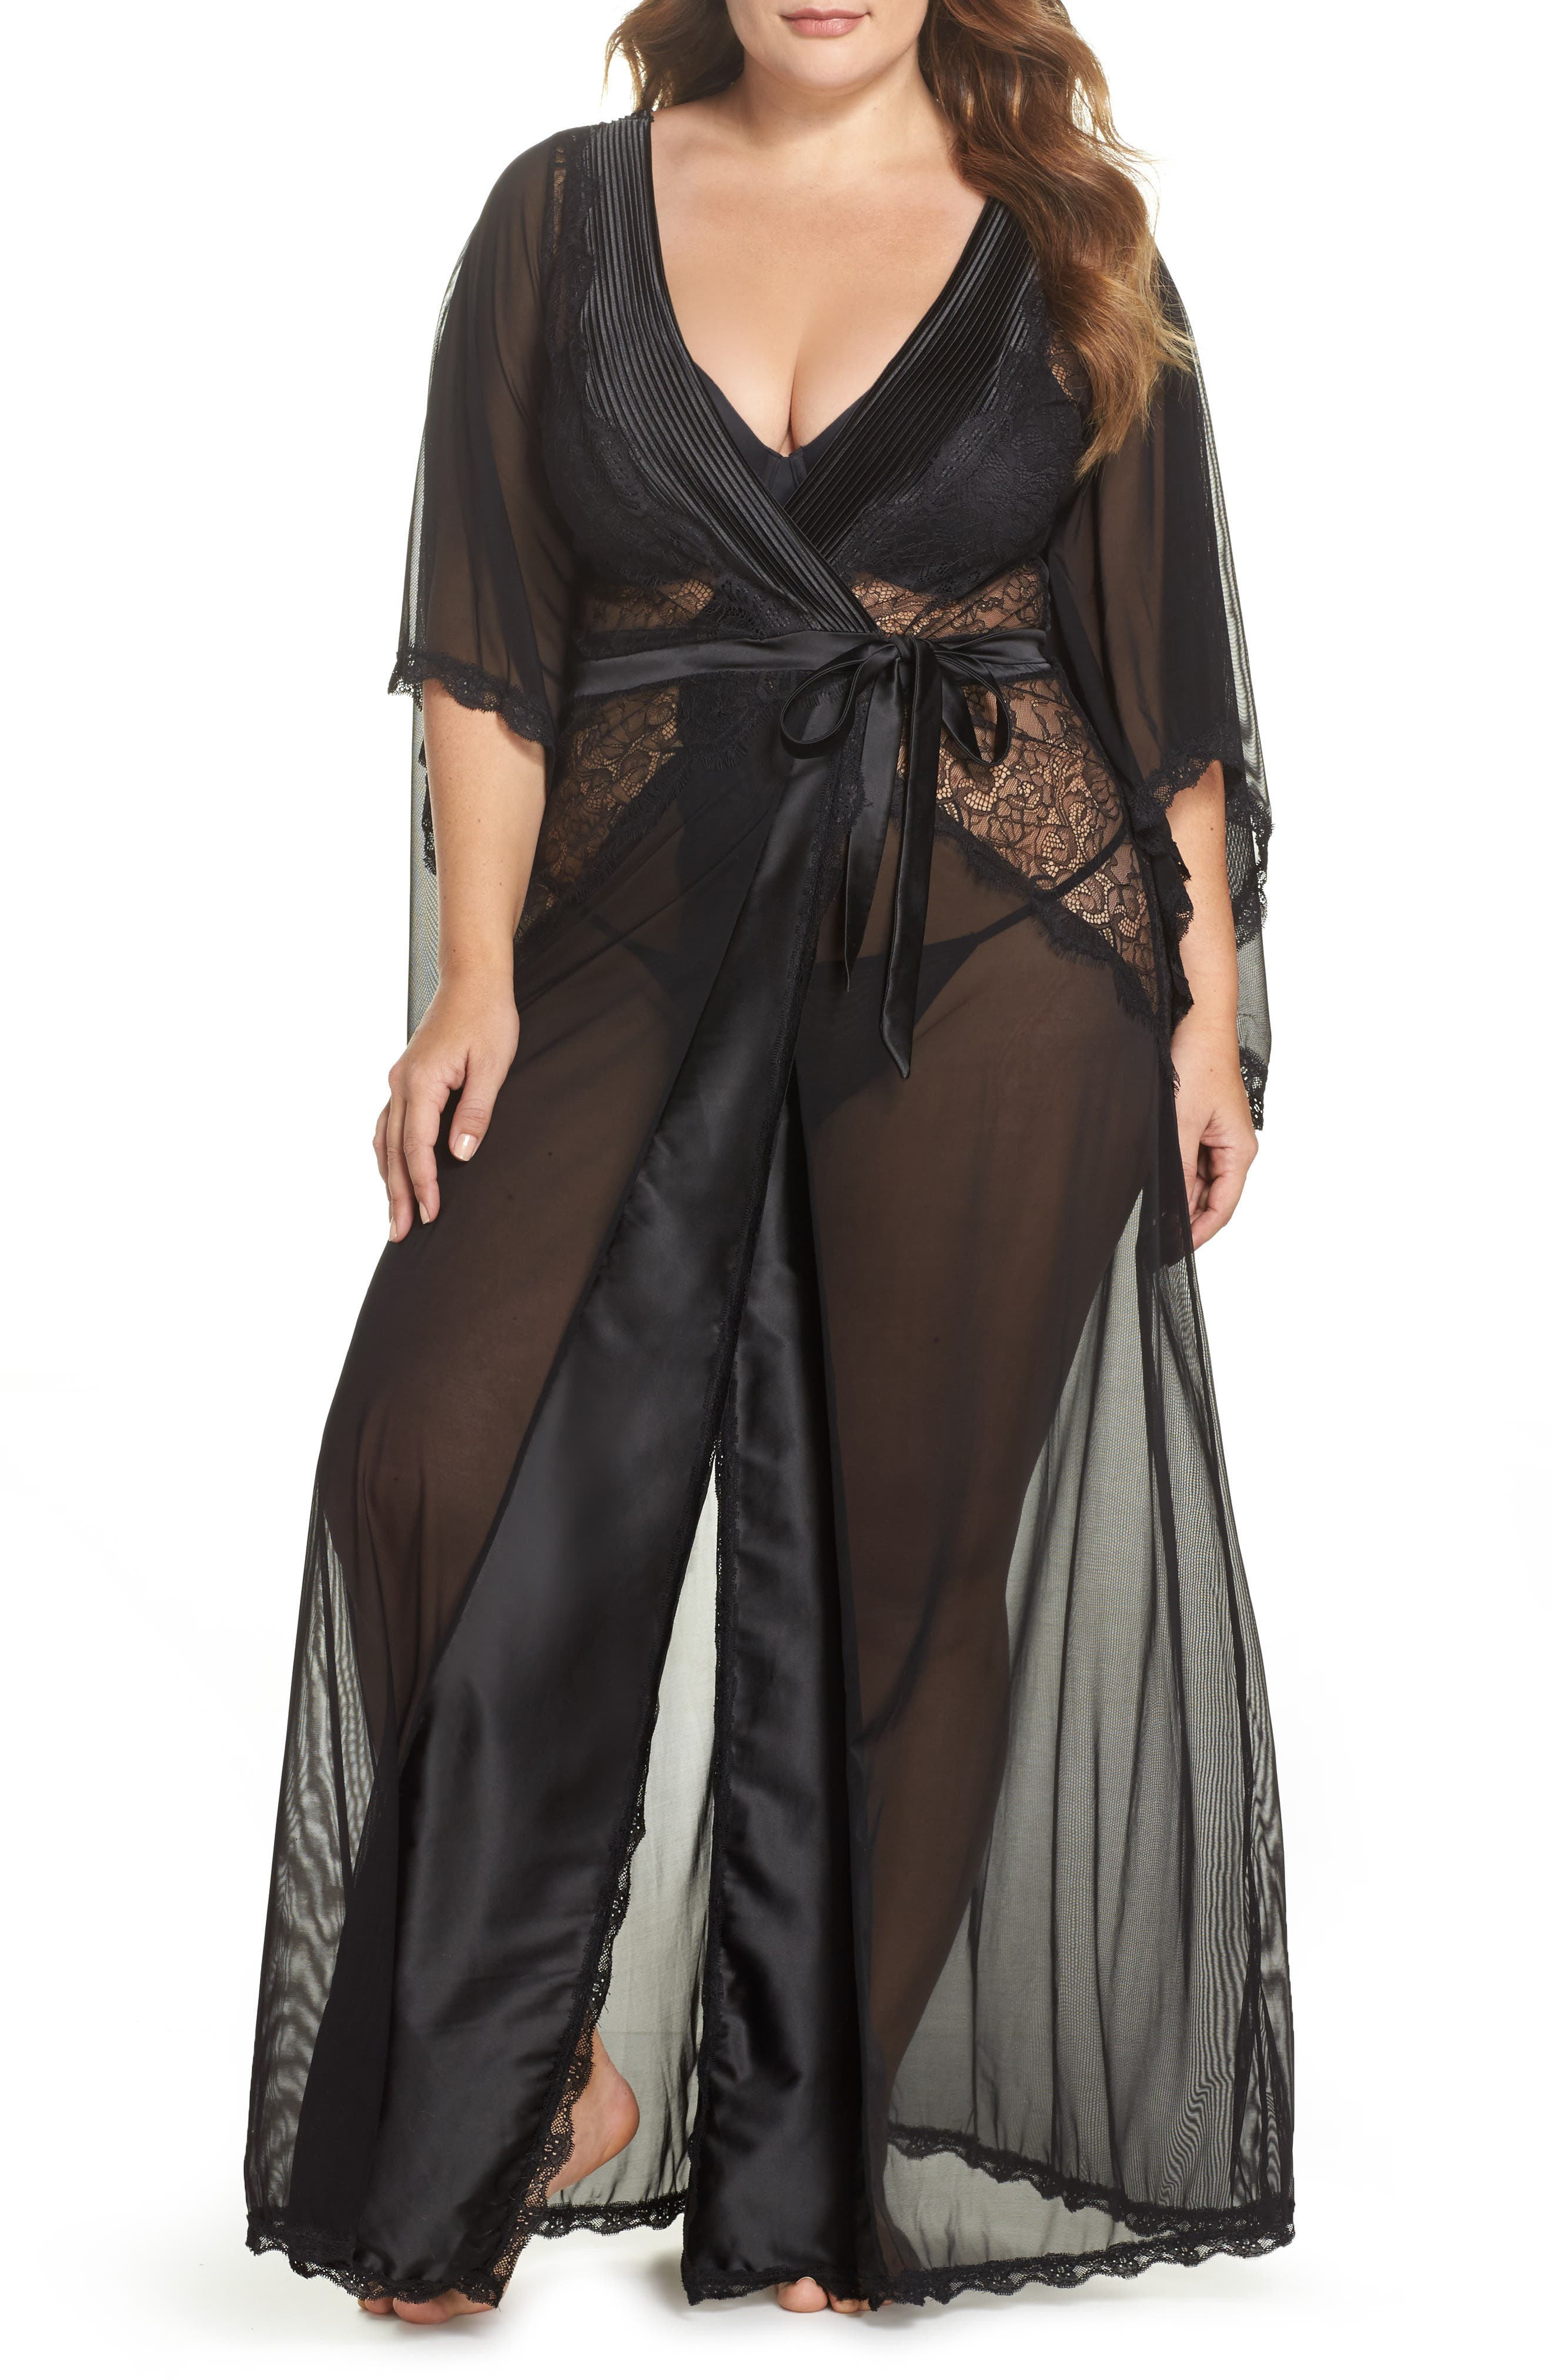 Main Image - Oh La La Cheri Nicolette Sheer Robe & G-String (Plus Size)